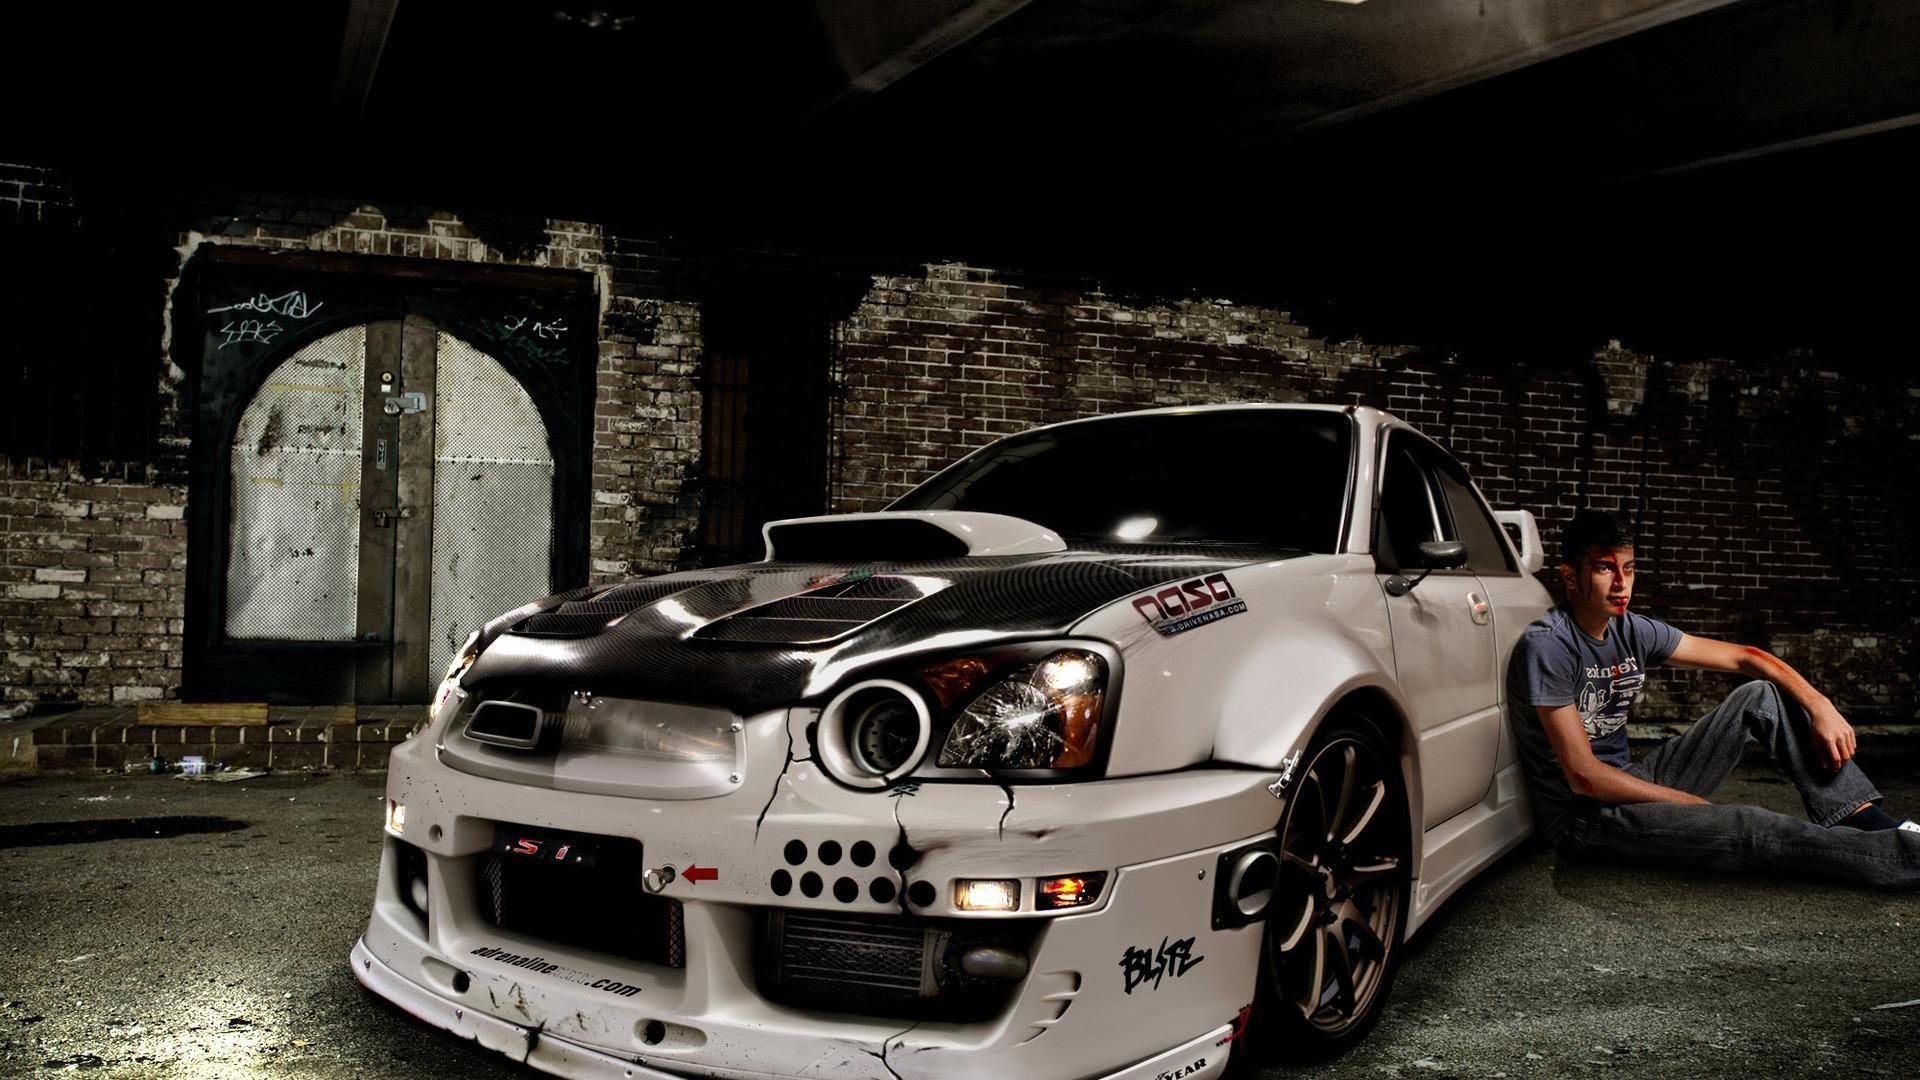 Subaru Impreza Crash Cars Desktop Hd Wallpaper Tuner Cars Car Wallpapers Subaru Impreza